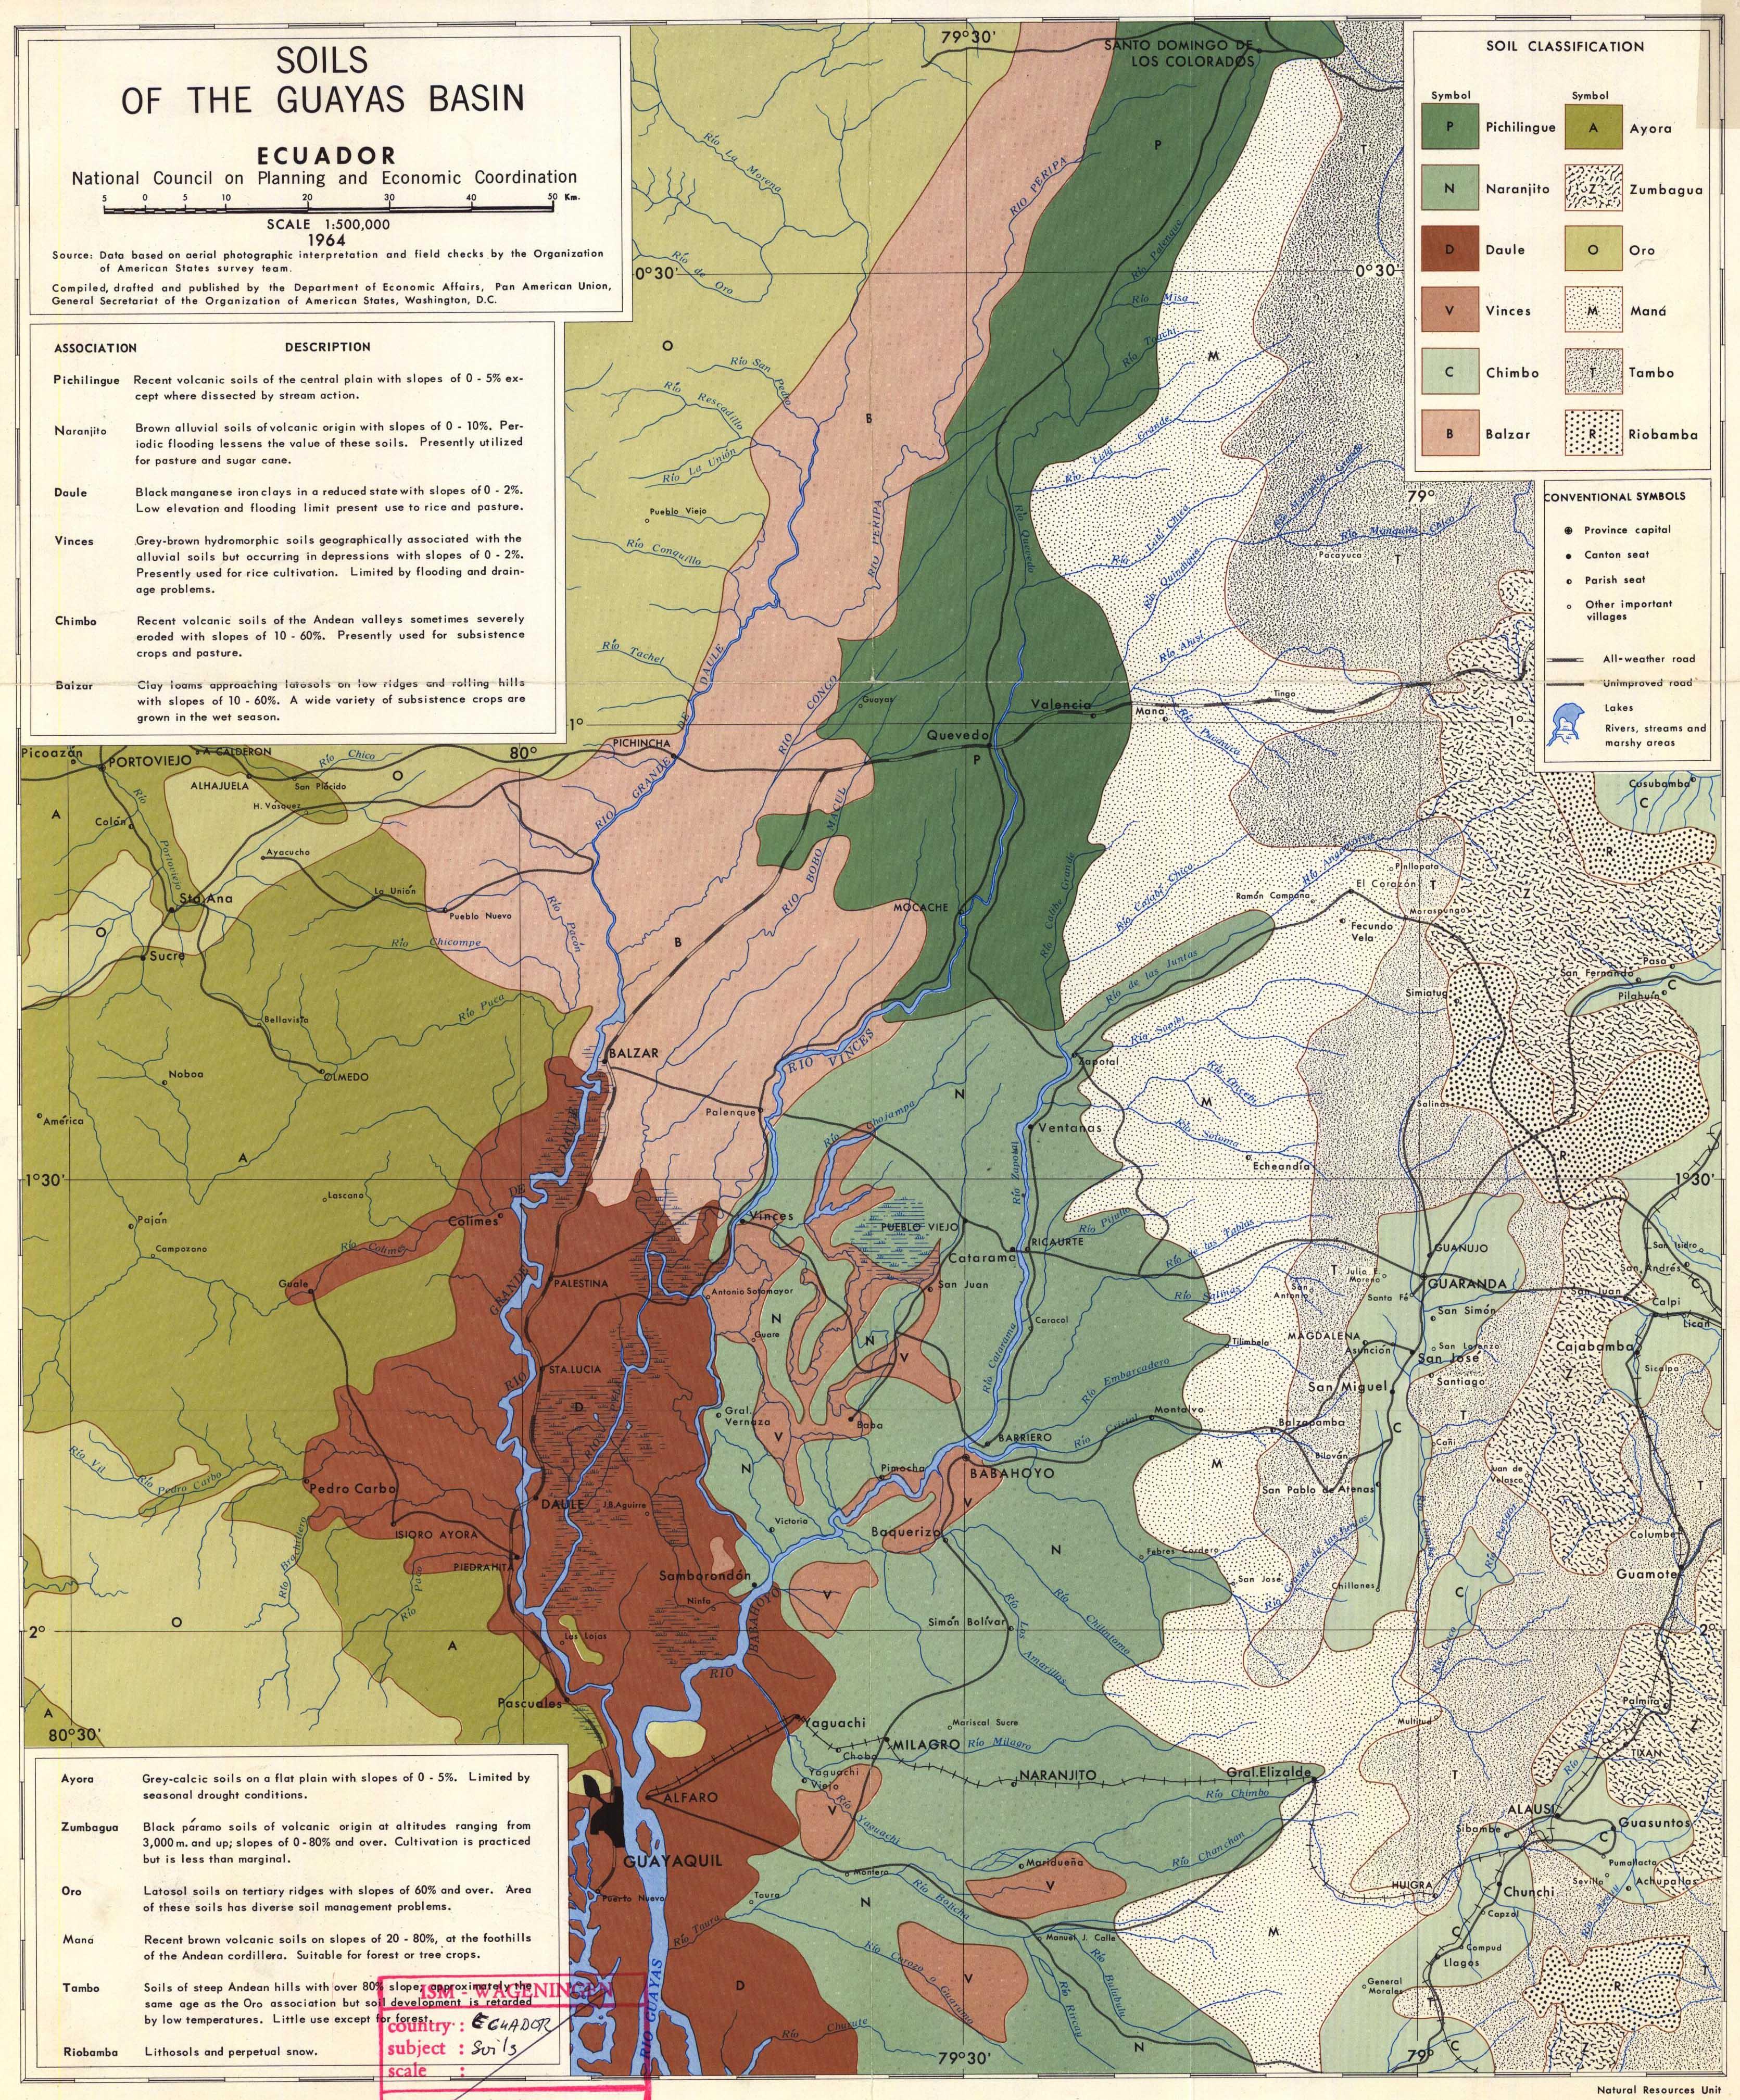 Soils of the Guayas basin 1964